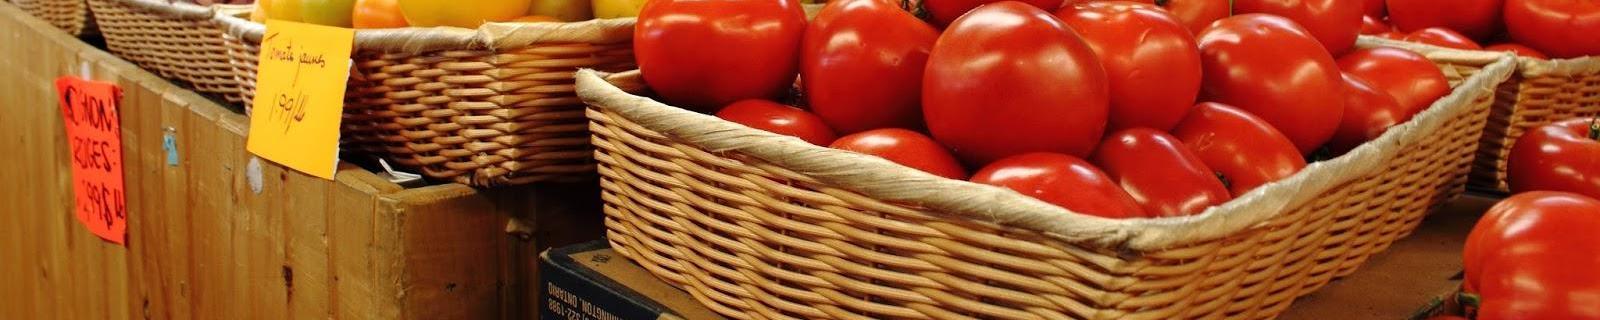 Tomates rellenos de bonito